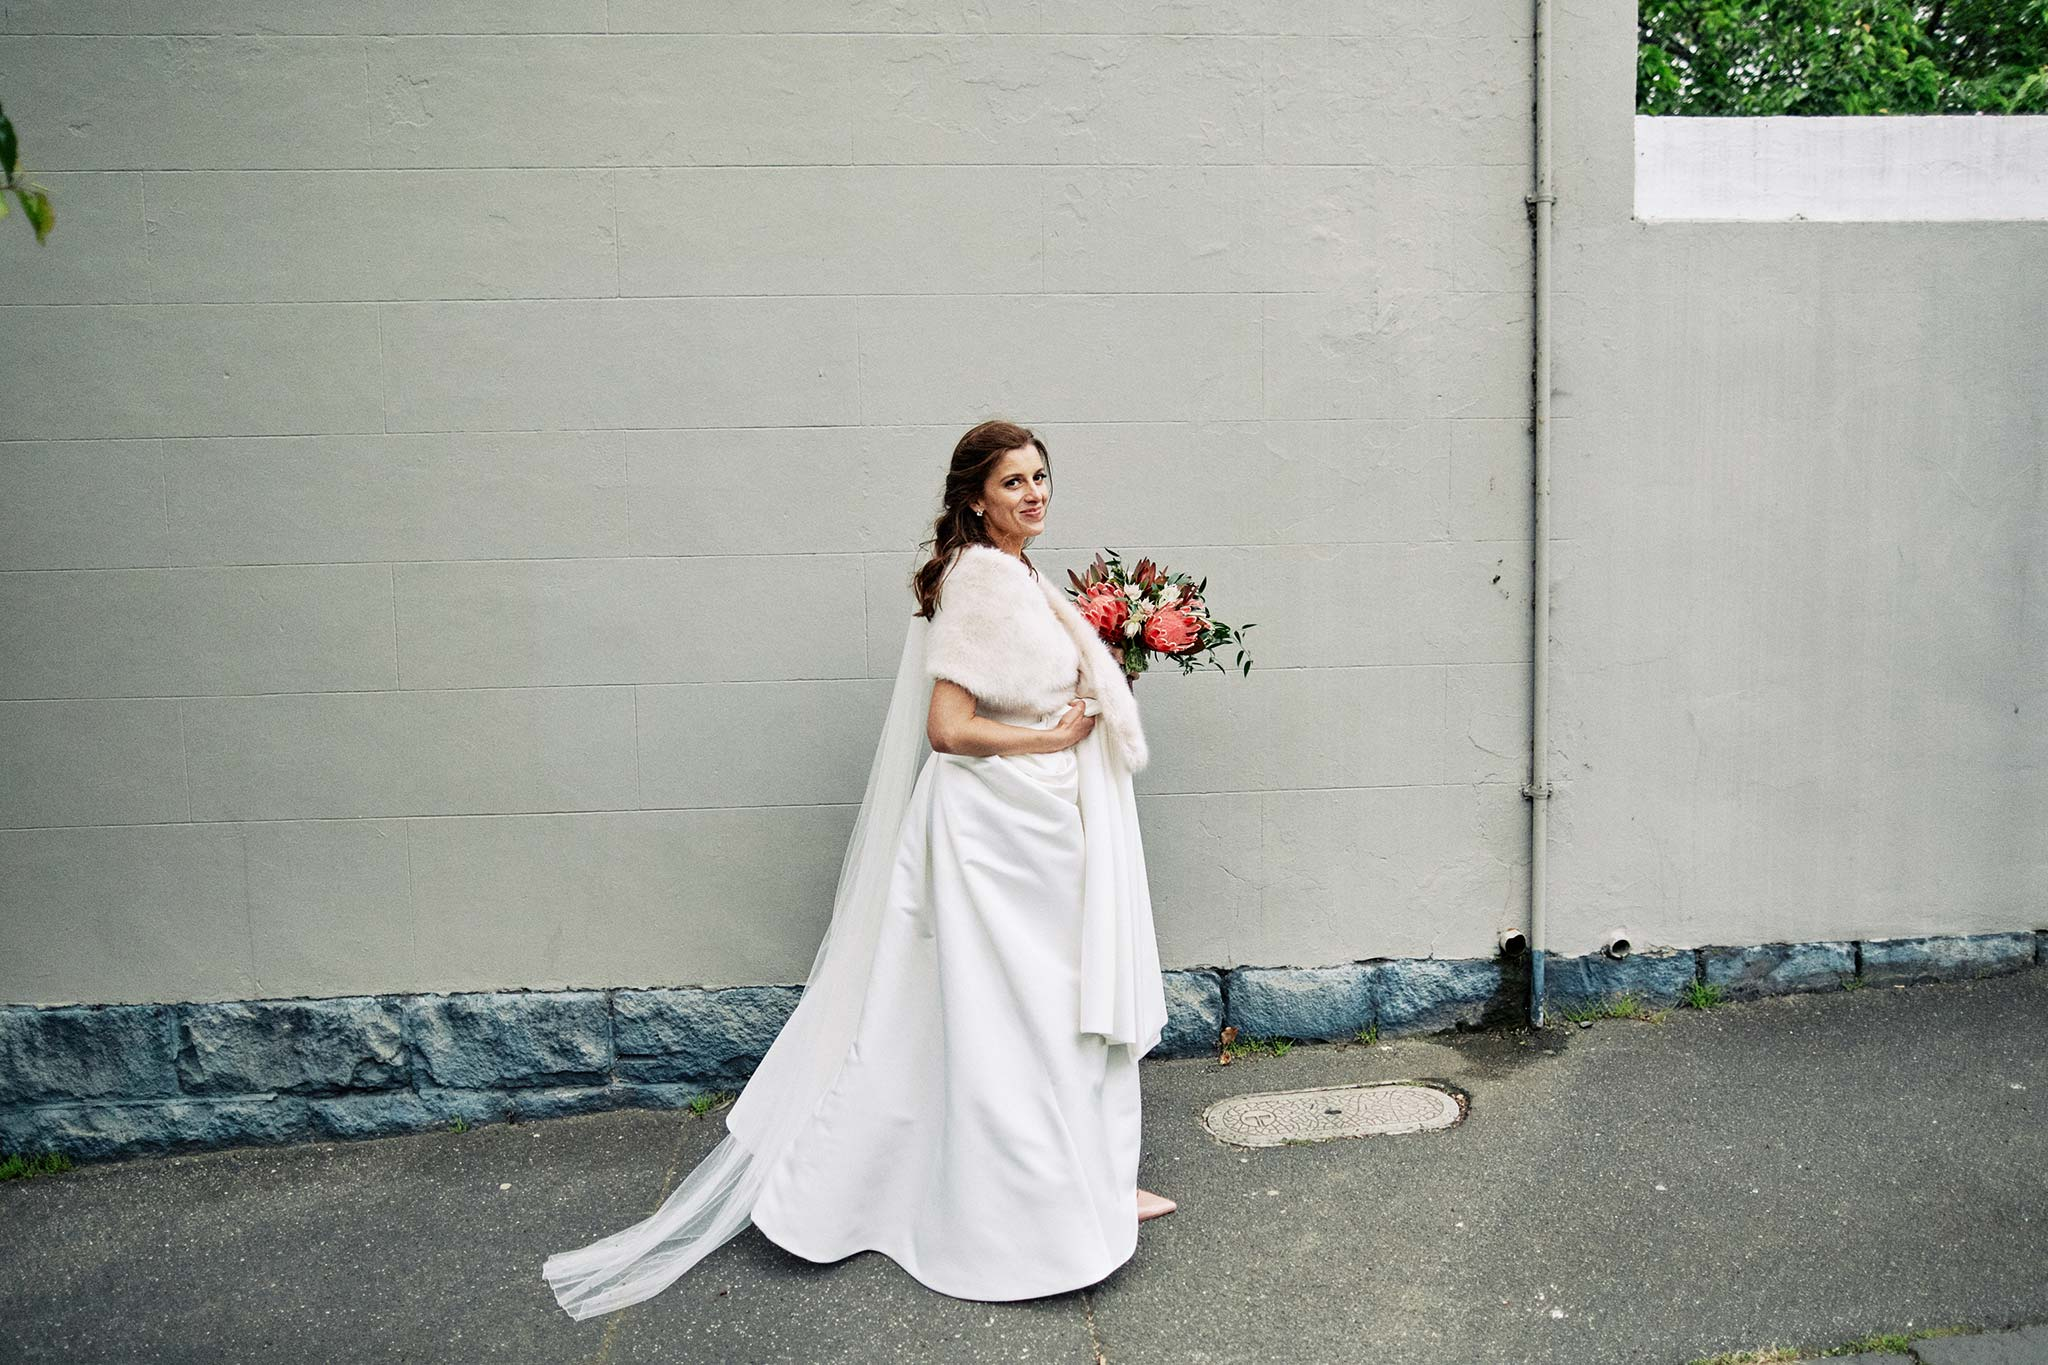 East Melbourne Wedding Photographer Bride walking in dress